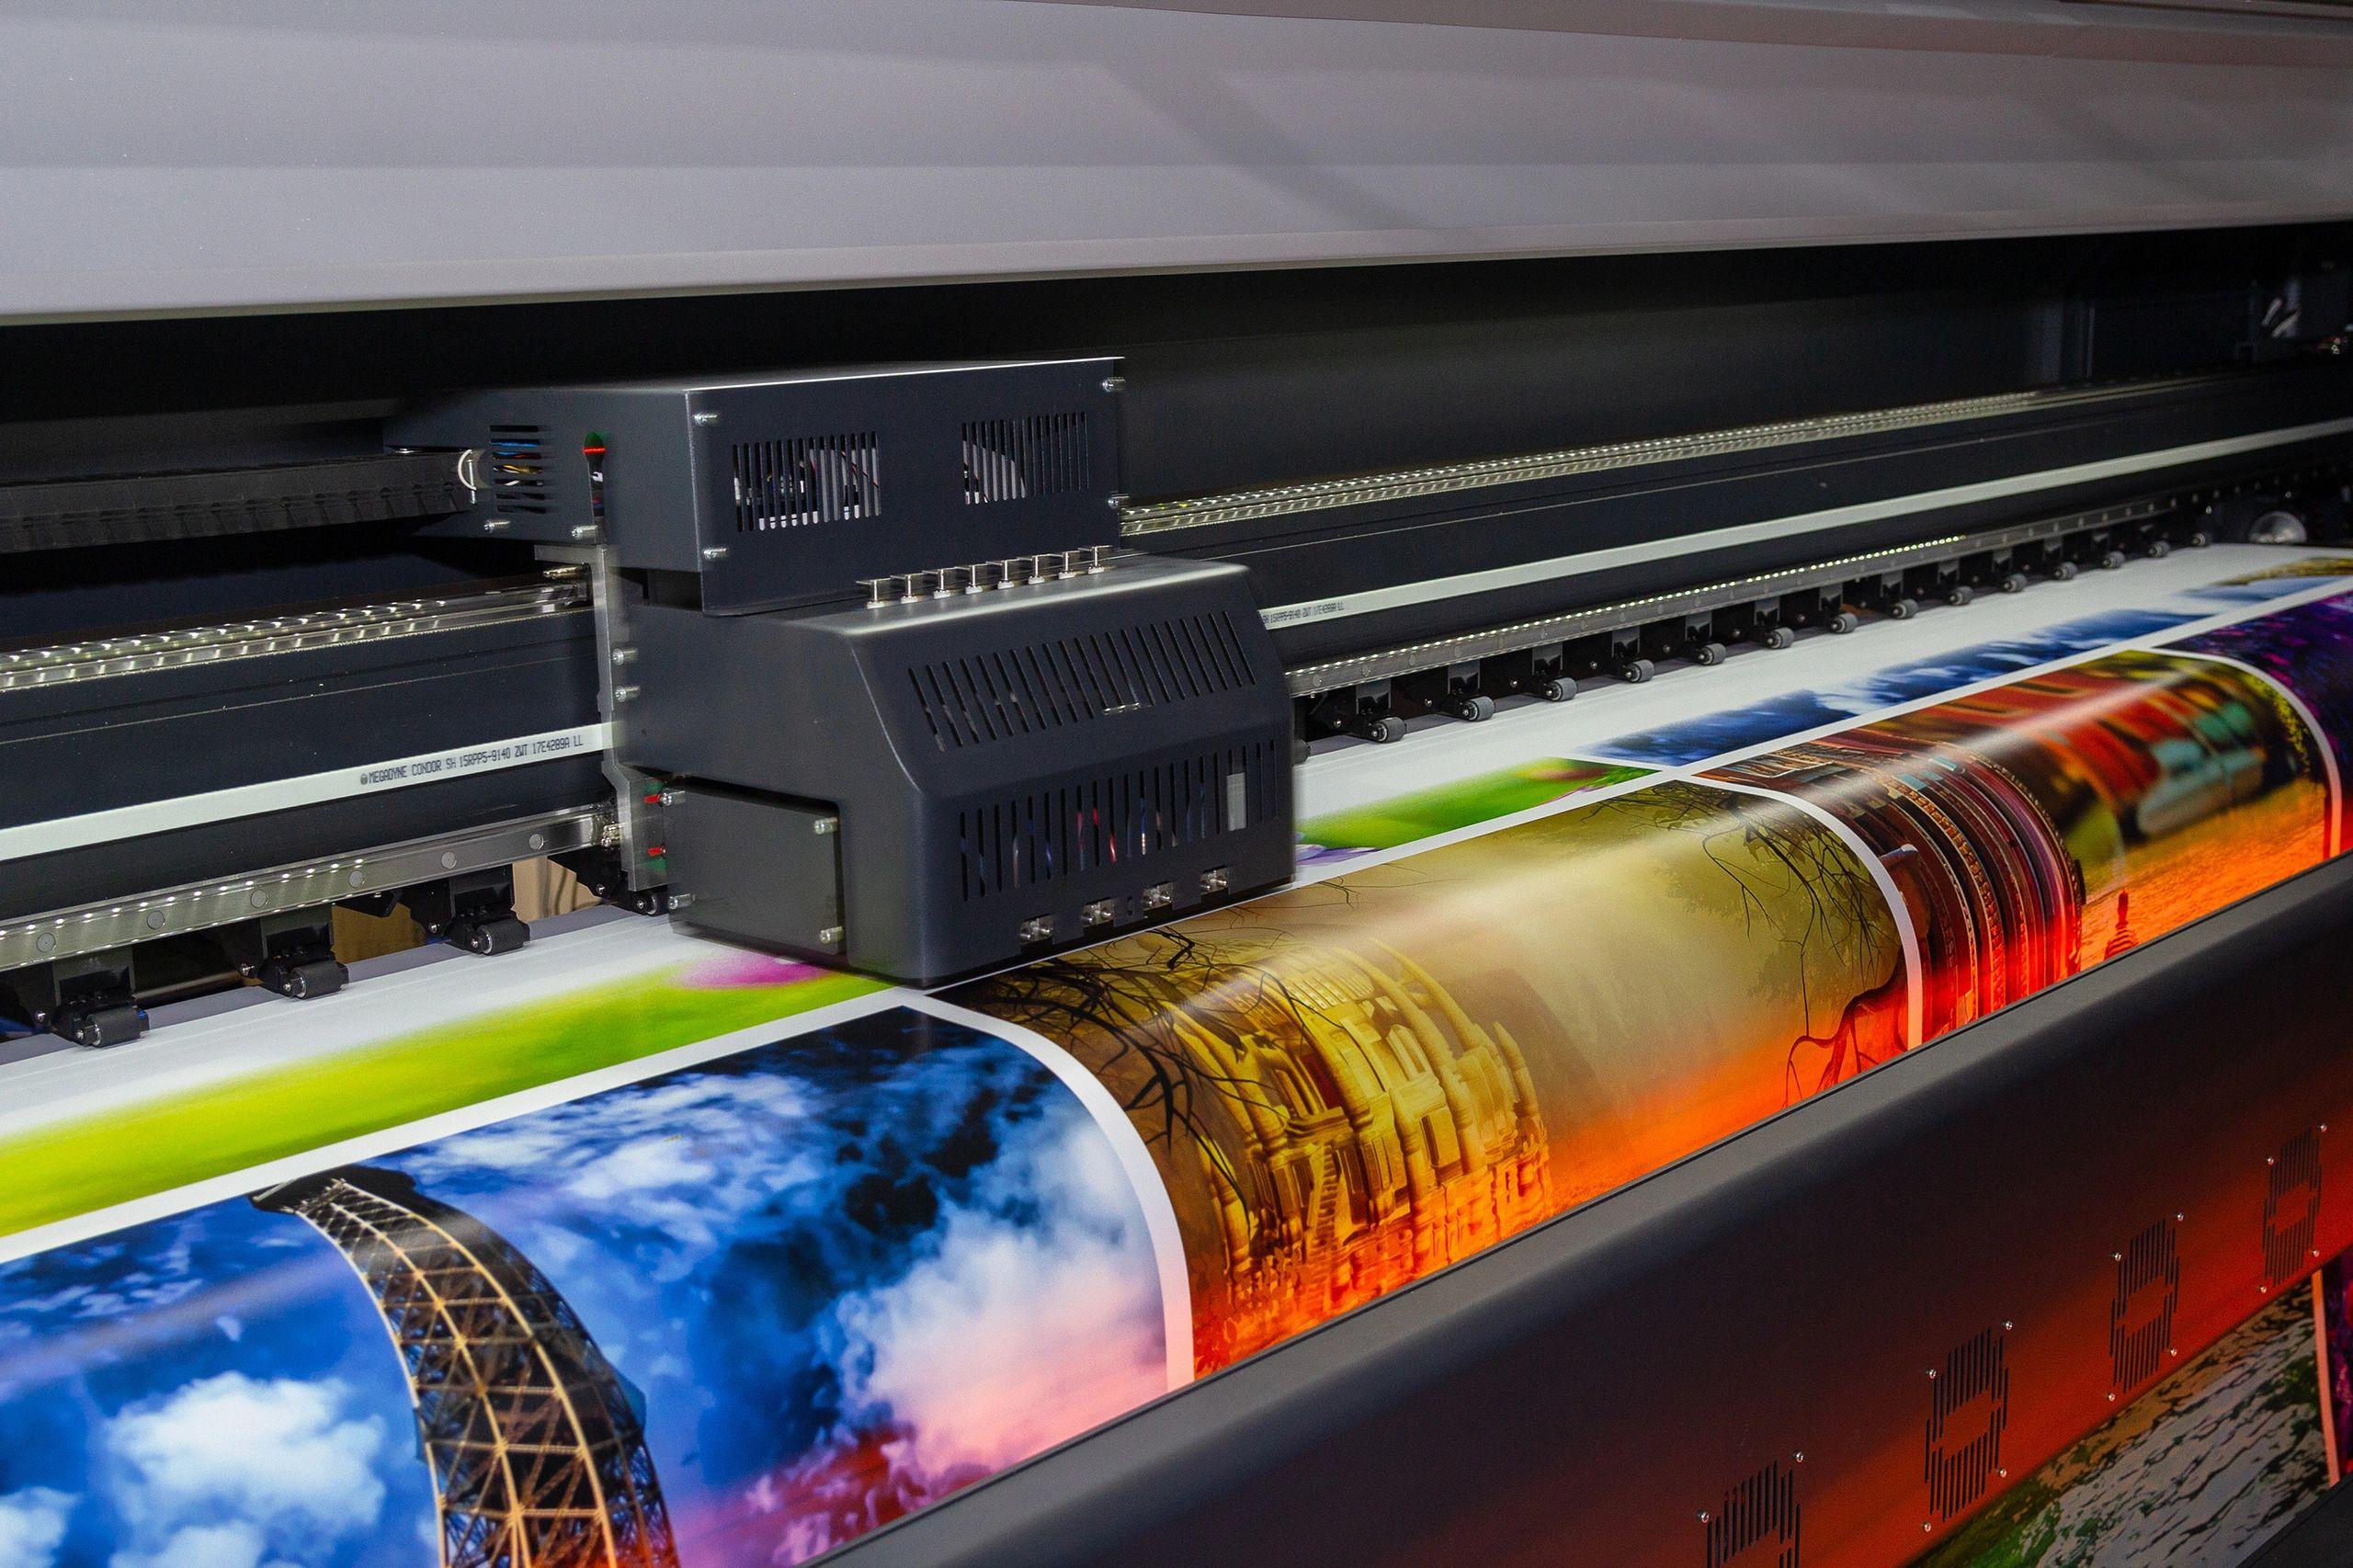 Plotters | Printers | Copiers Scanners | Projectors